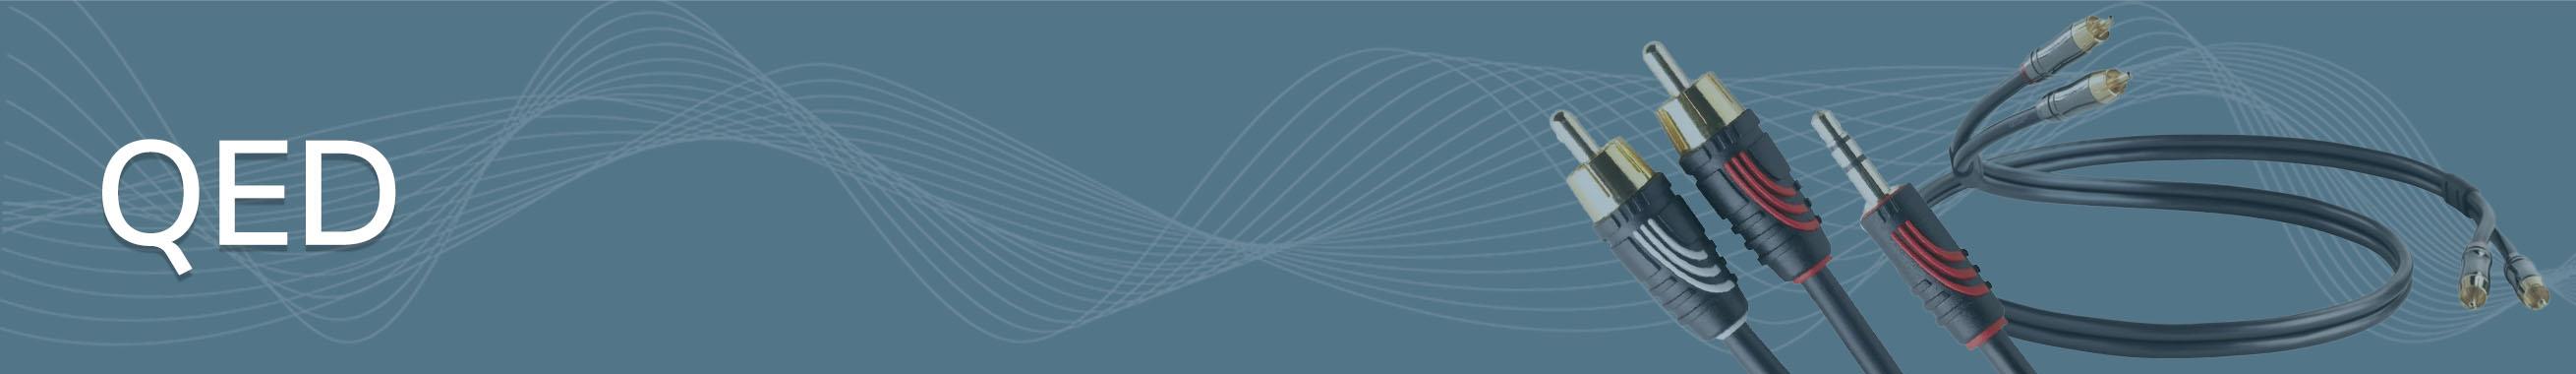 QED audio producten